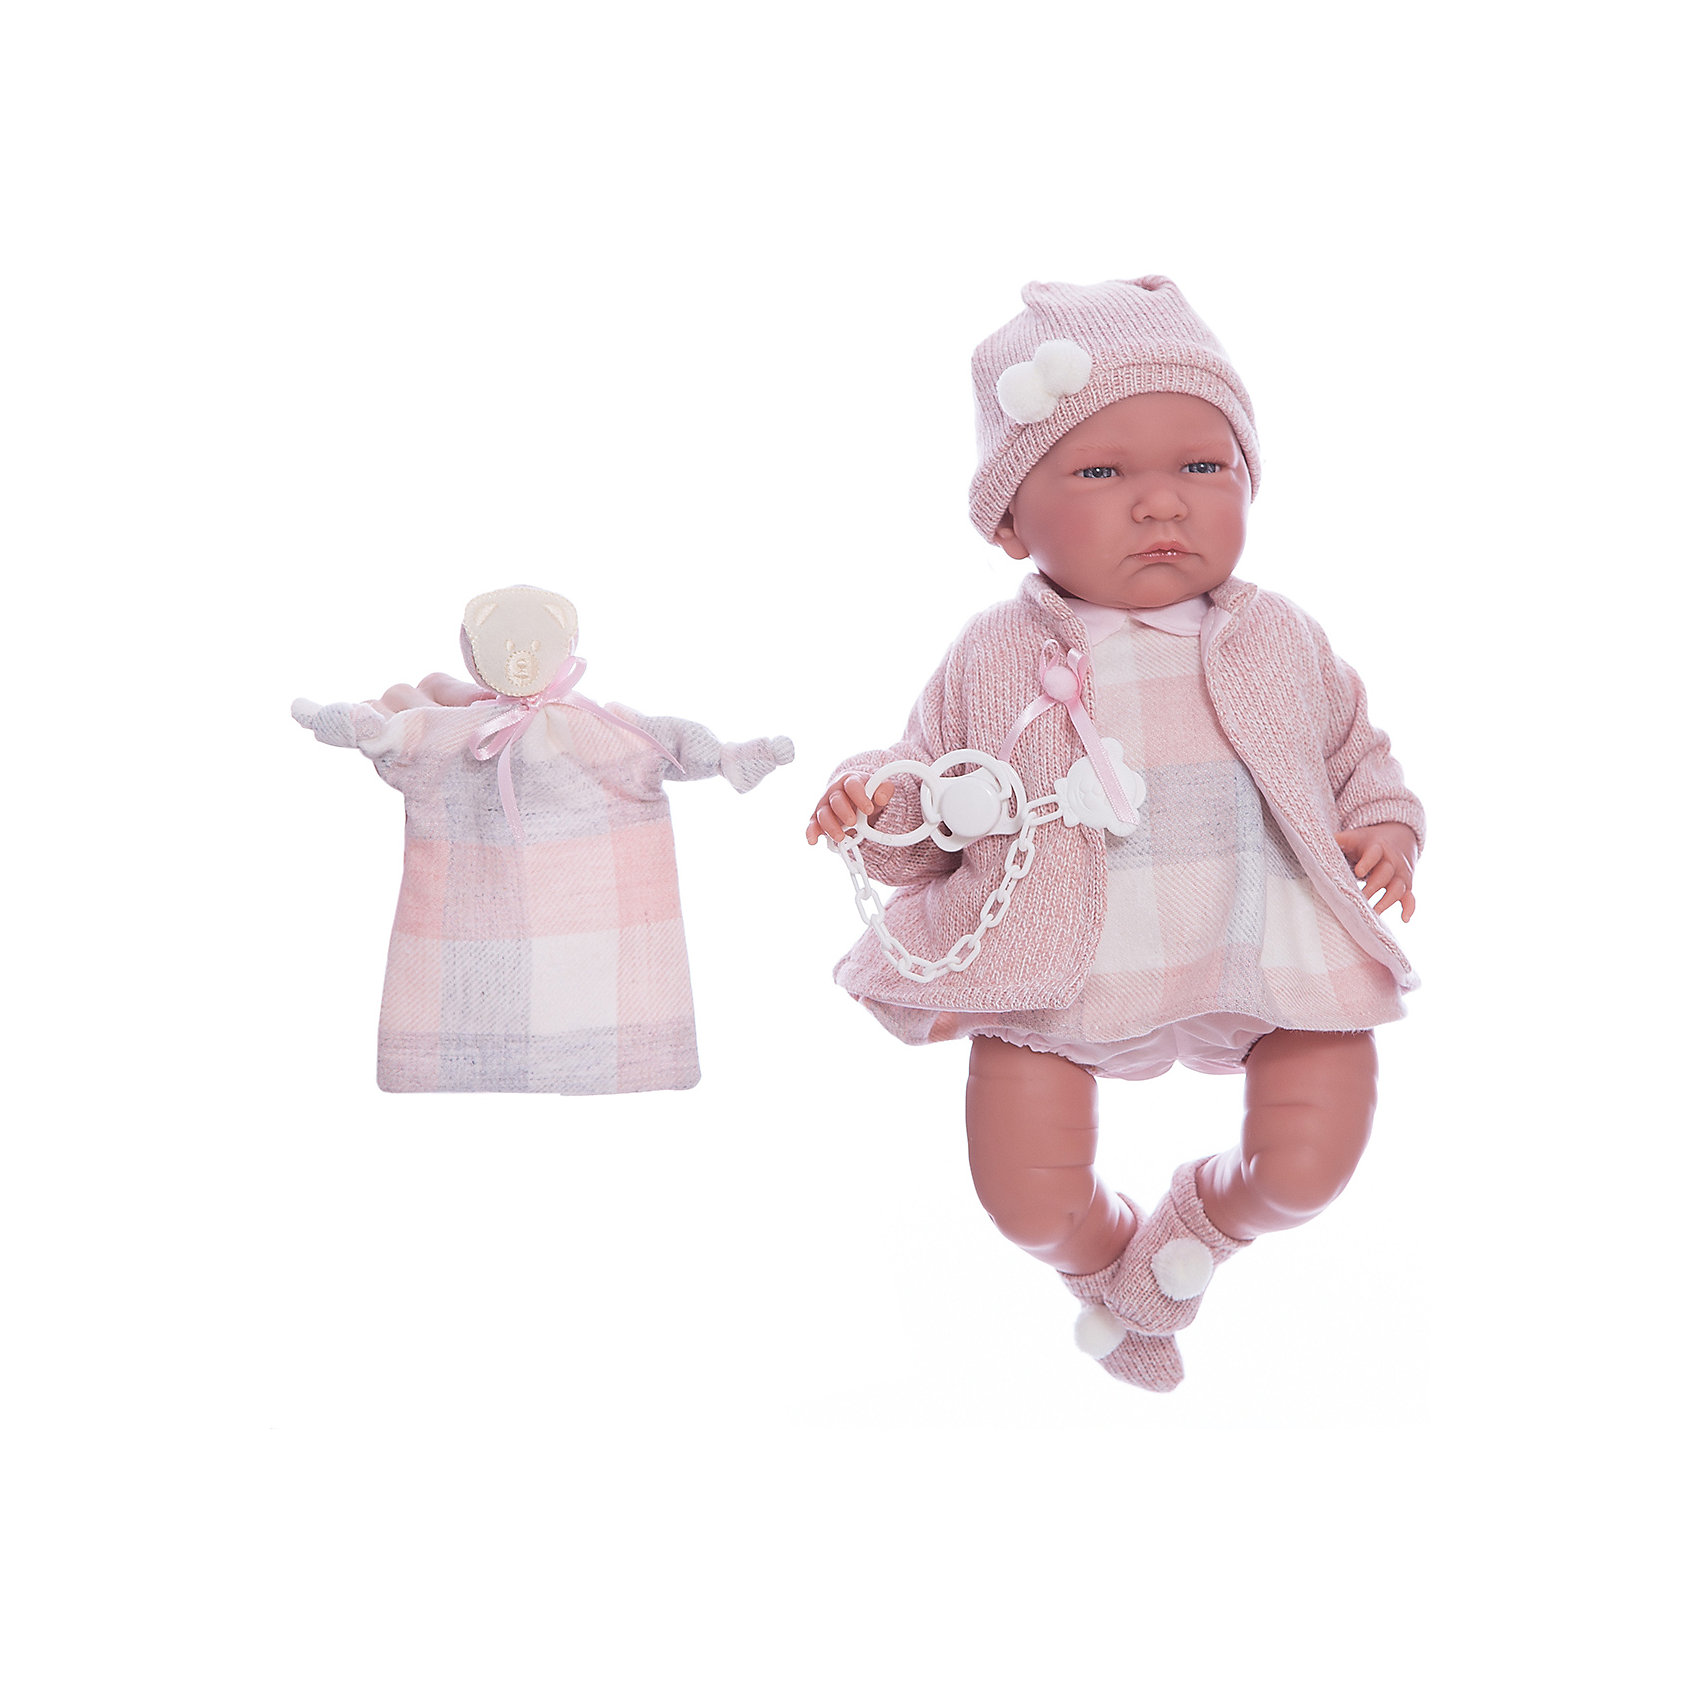 Llorens Кукла Лала, 40 см, Llorens куклы и одежда для кукол llorens кукла изабела 33 см со звуком